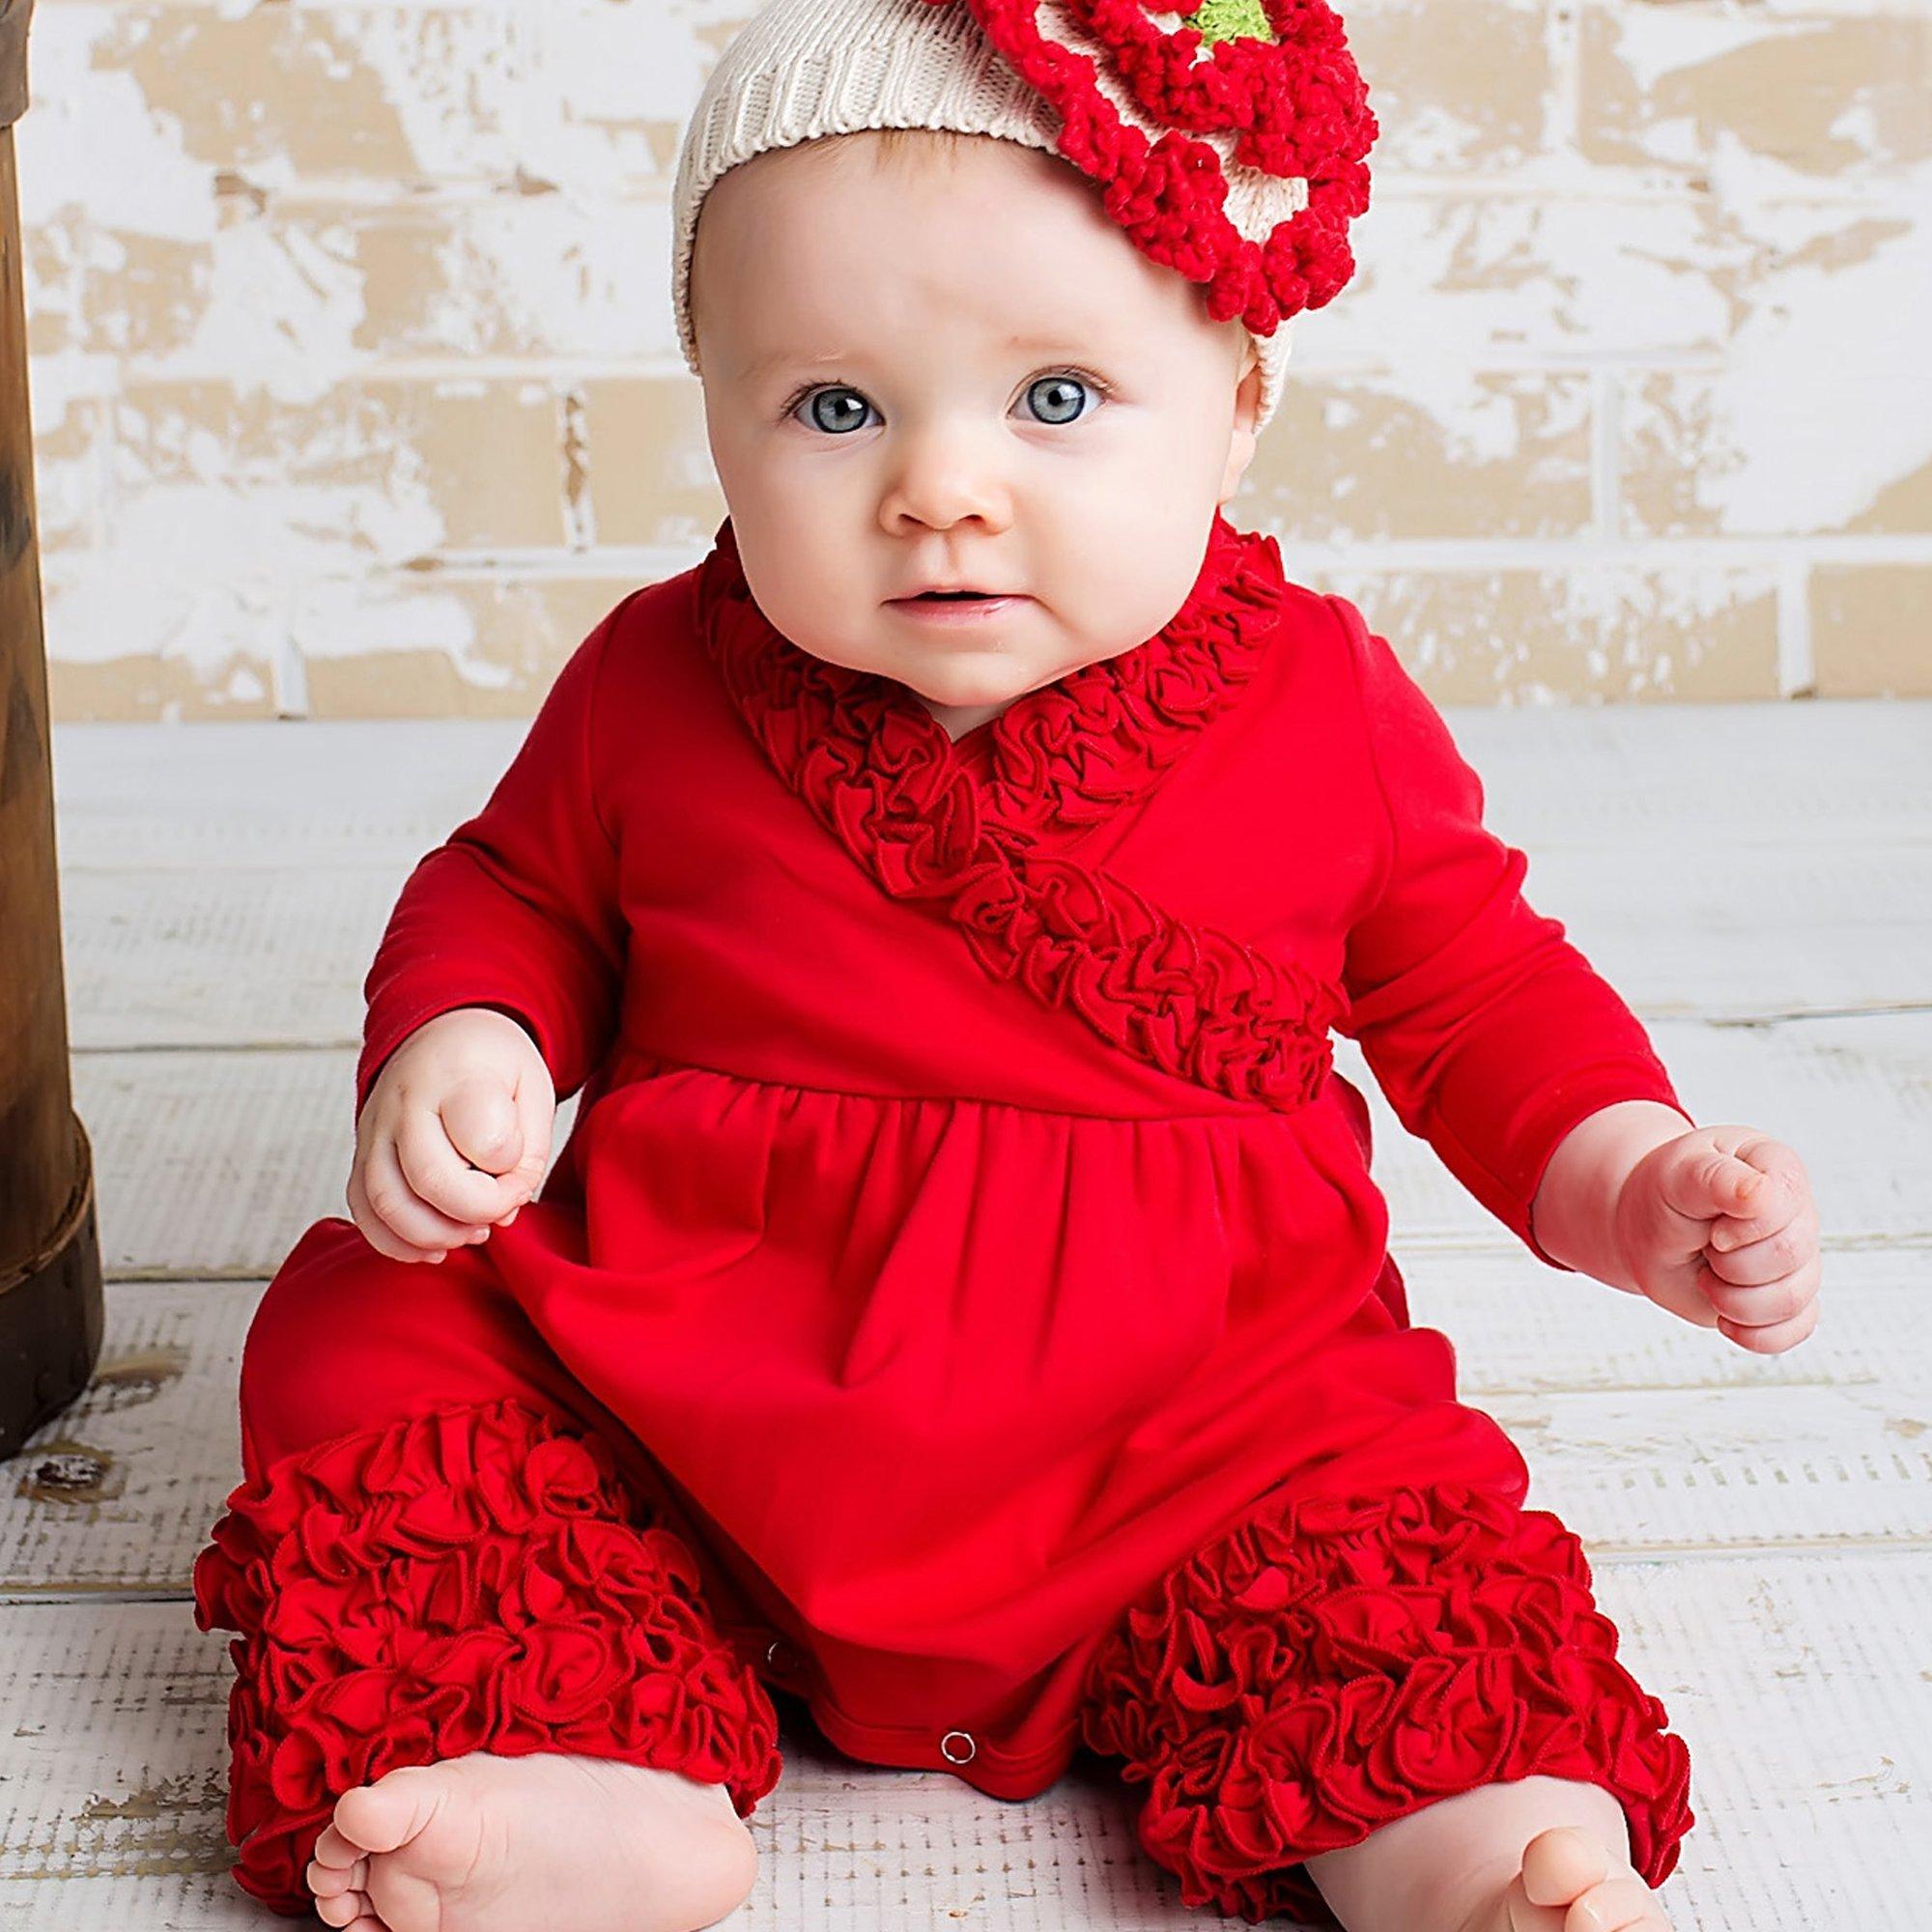 f91edbba7 Holiday Red Baby Romper - Lemon Loves Layette